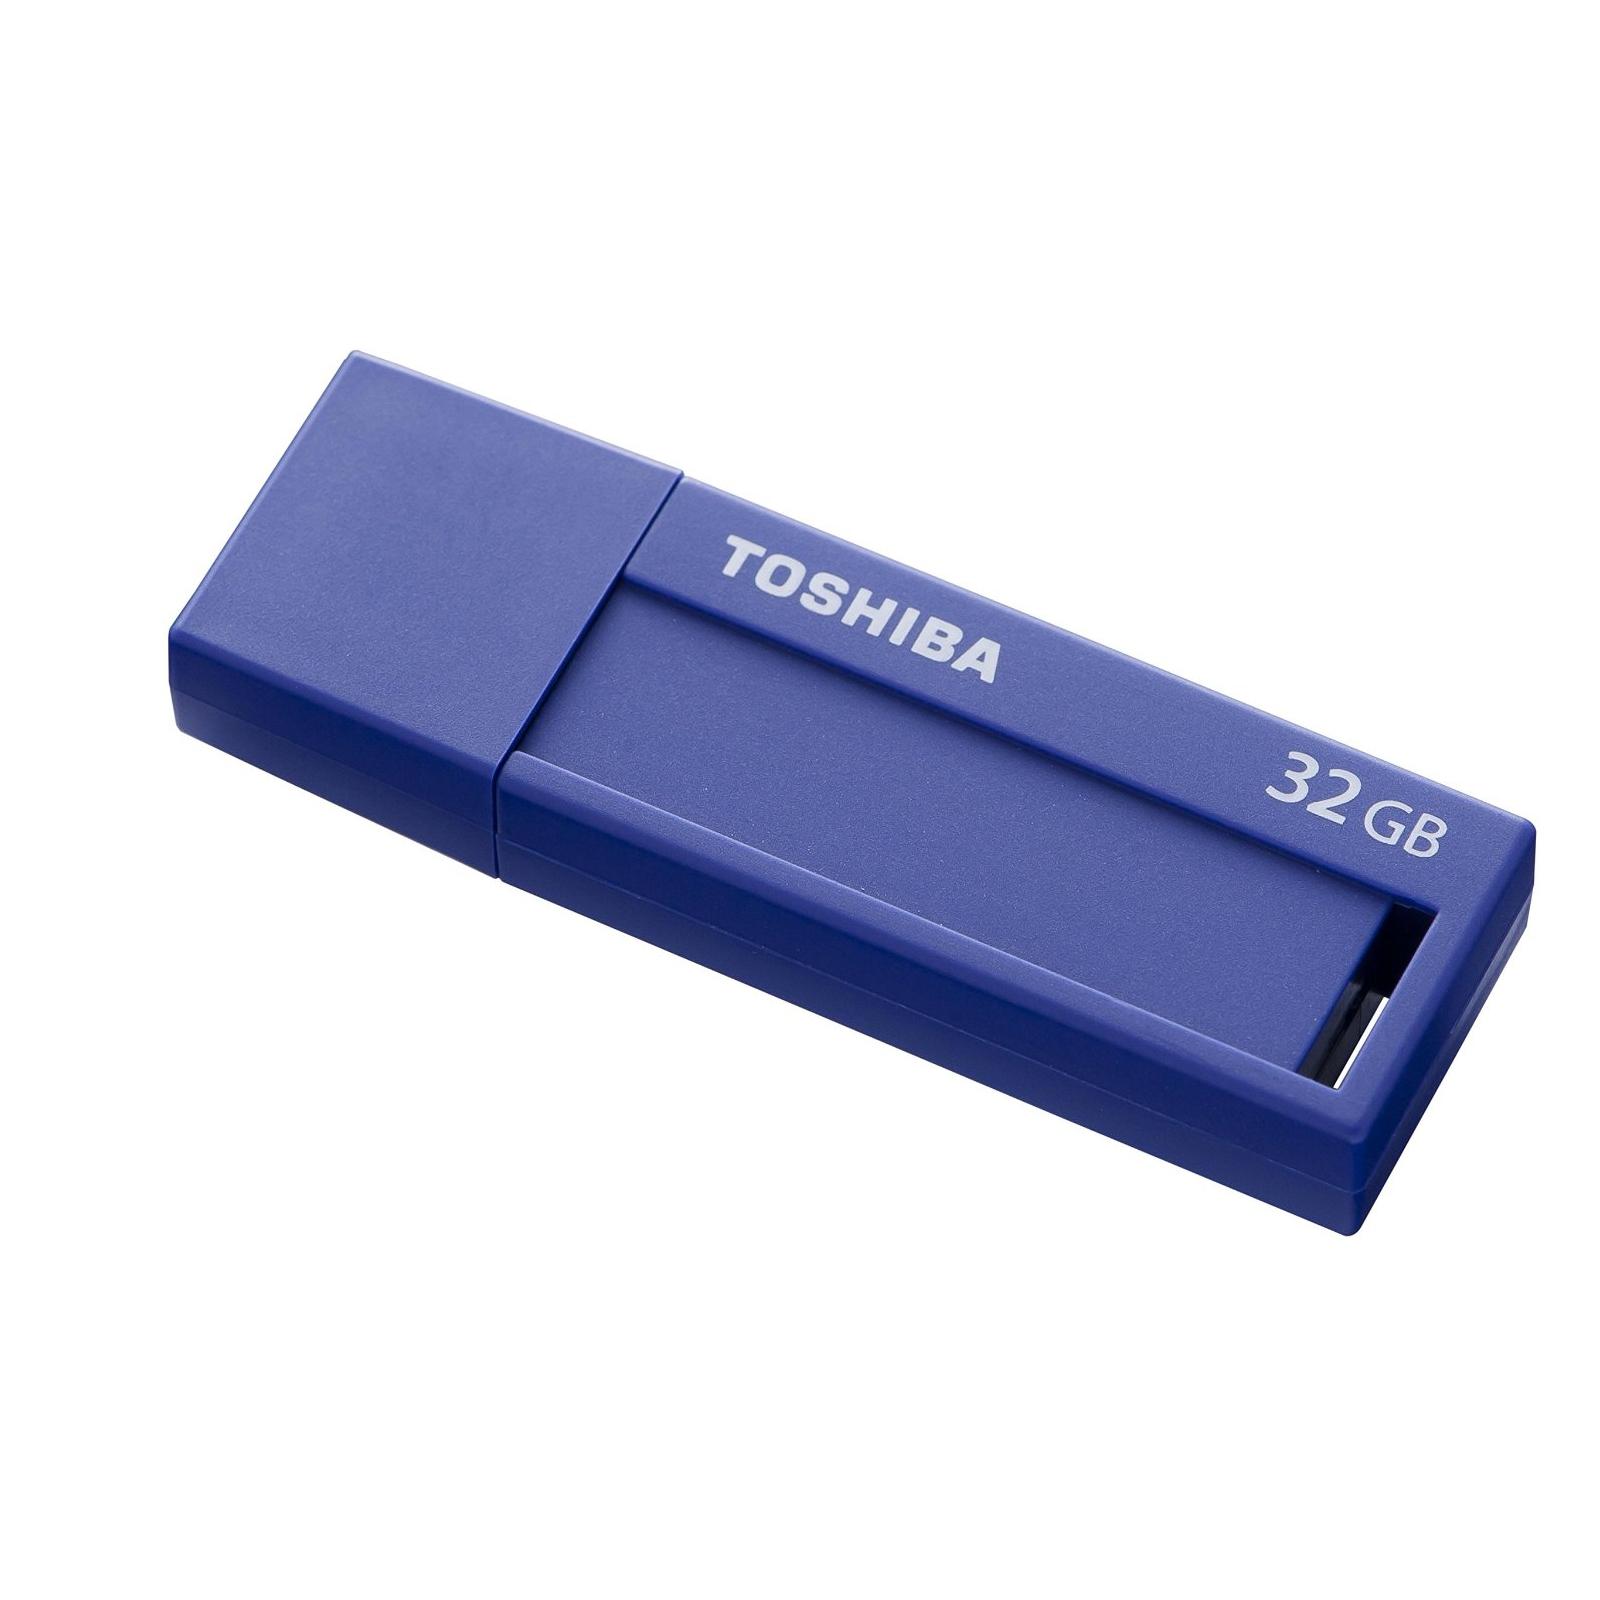 USB флеш накопитель TOSHIBA 32GB Daichi Blue USB 3.0 (THN-U302B0320M4) изображение 2